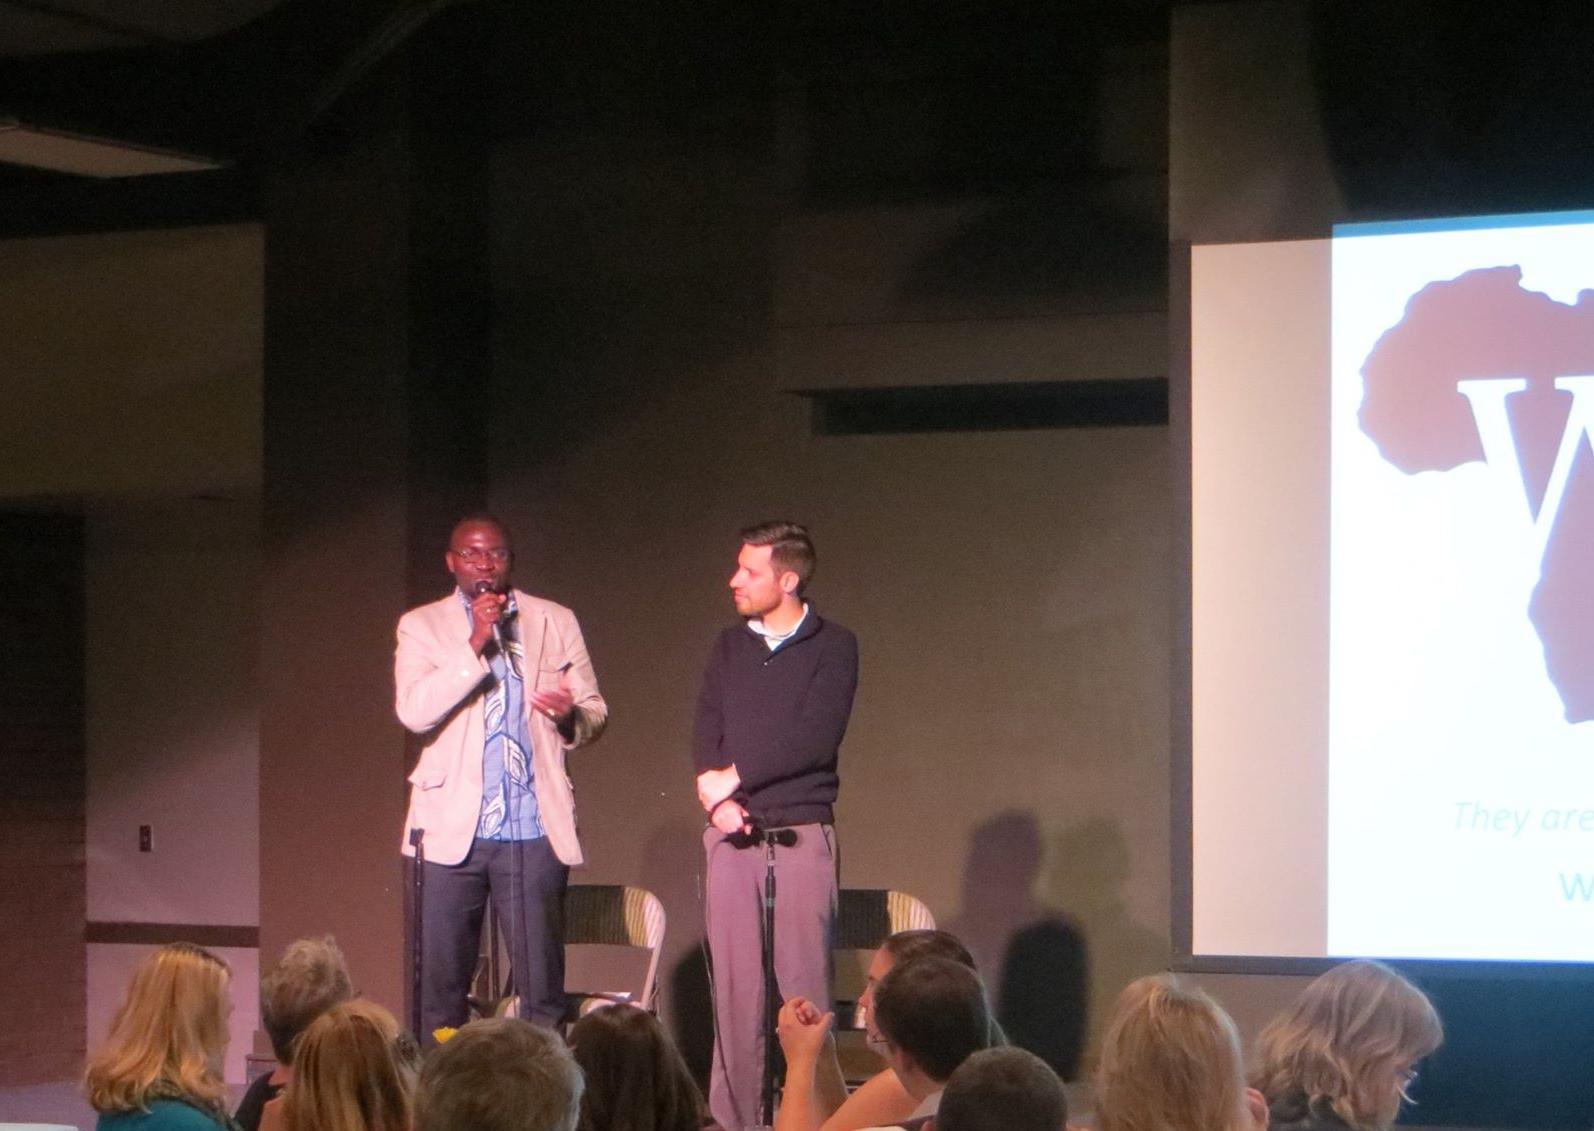 WAVS School Director Almamo Danfa and WAVS Executive Director Chris Collins at a presentation in February 2015